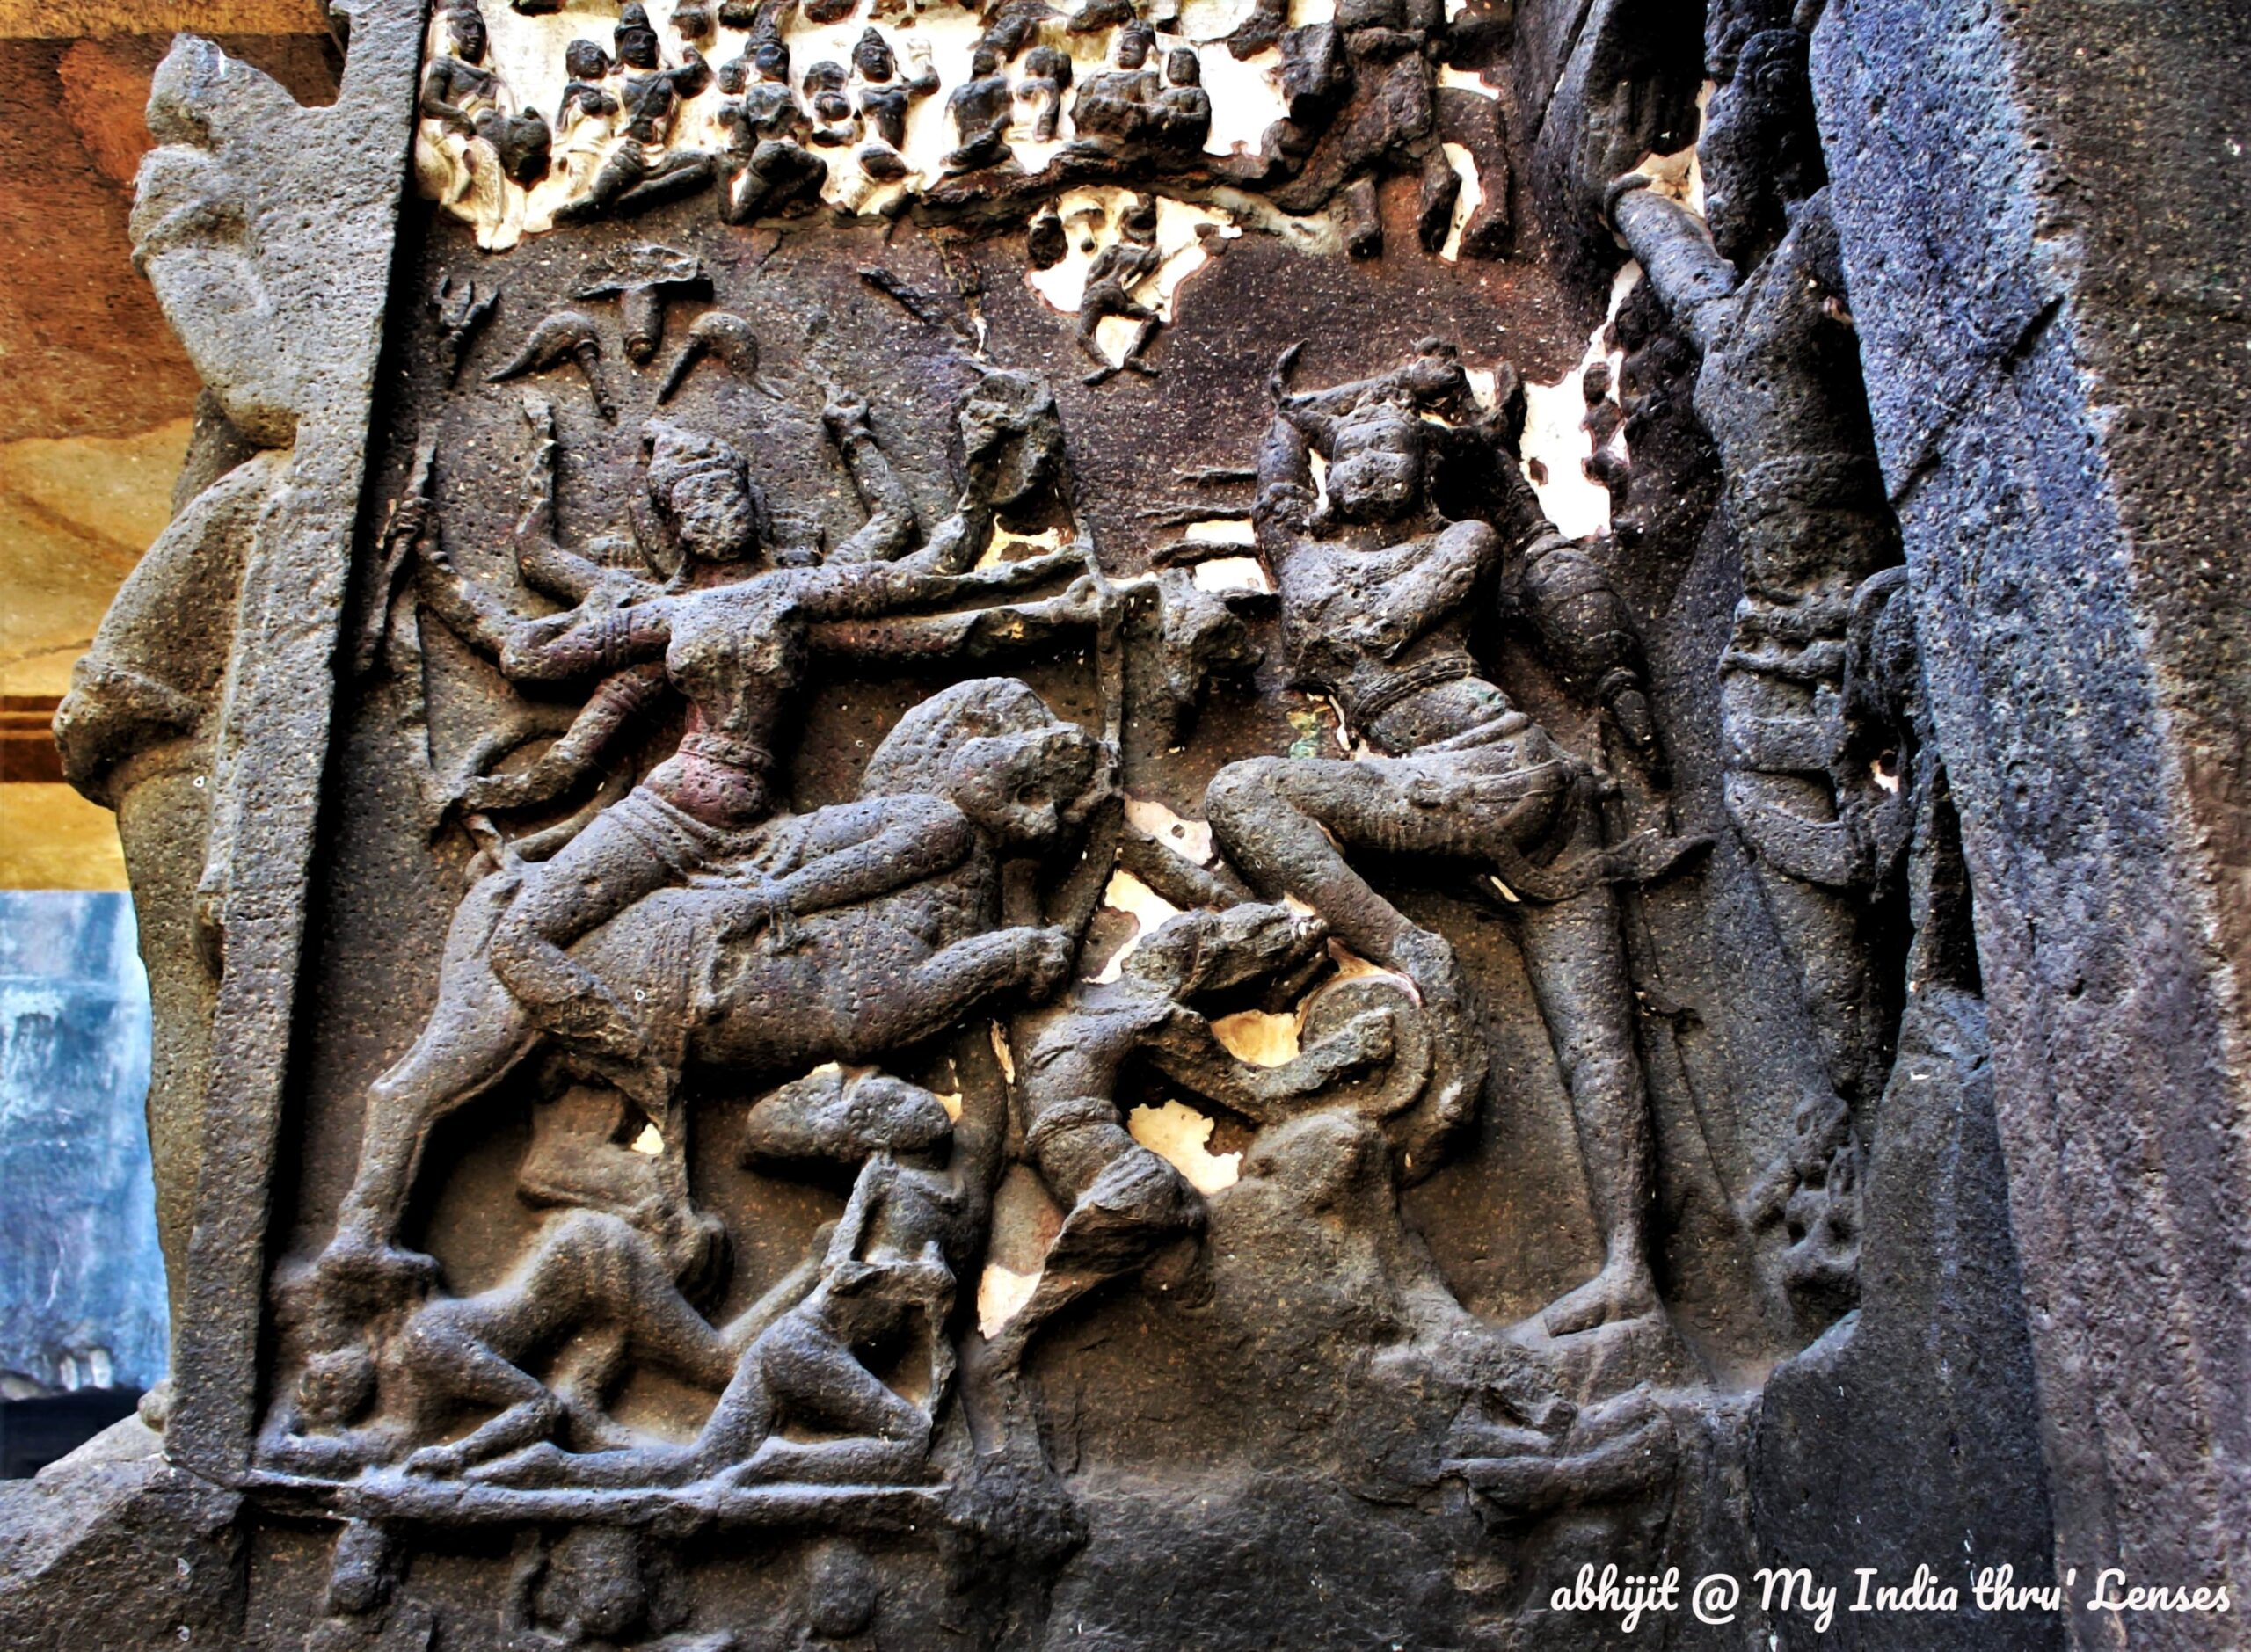 Mahishasuramardini sculpture, Kailash Temple, Ellora Caves